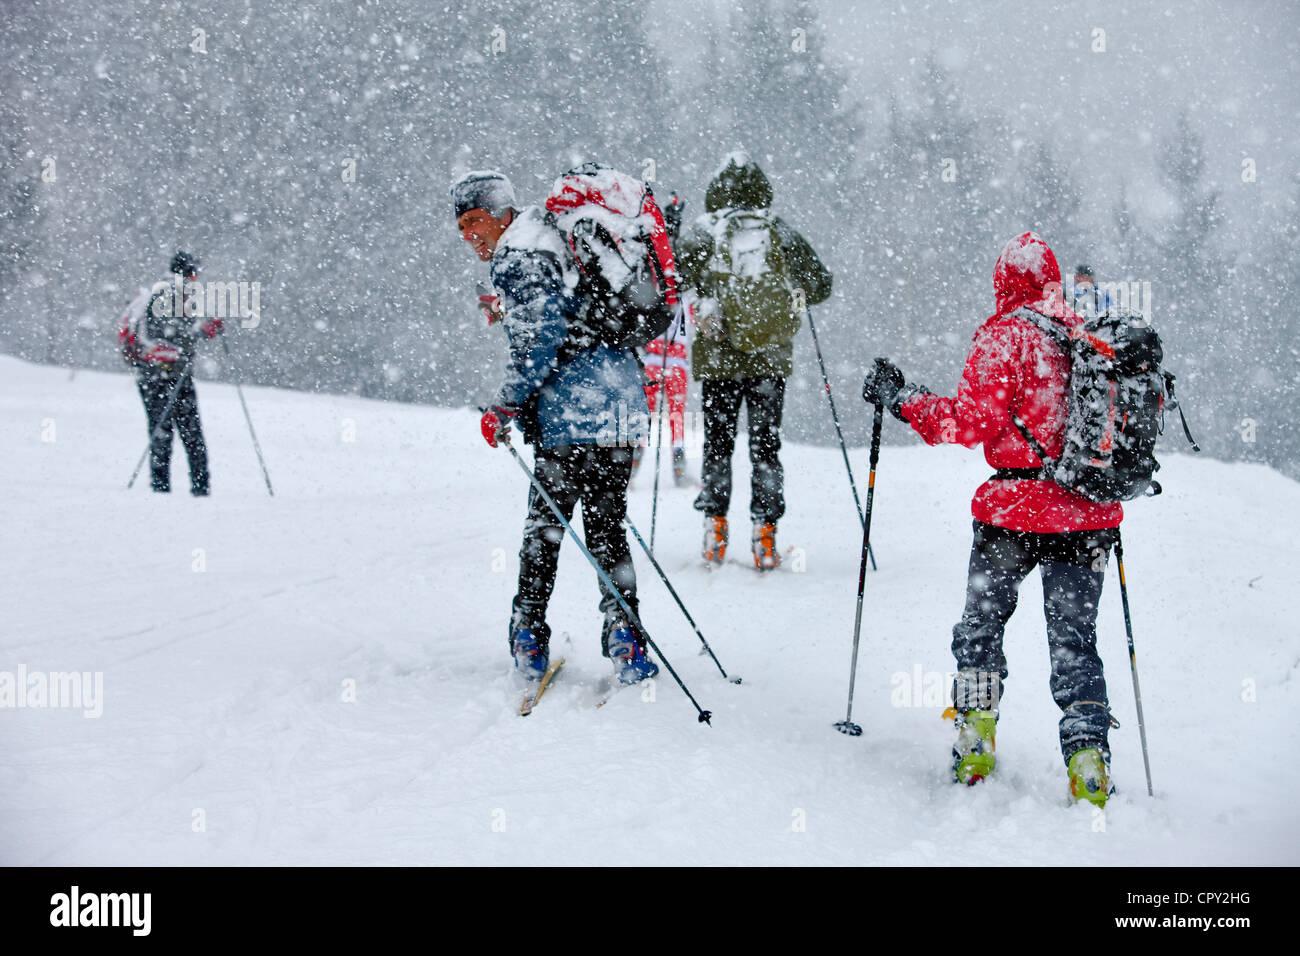 France, Savoie, Naves, Tarentaise Valley, ski touring under a snow soaker - Stock Image